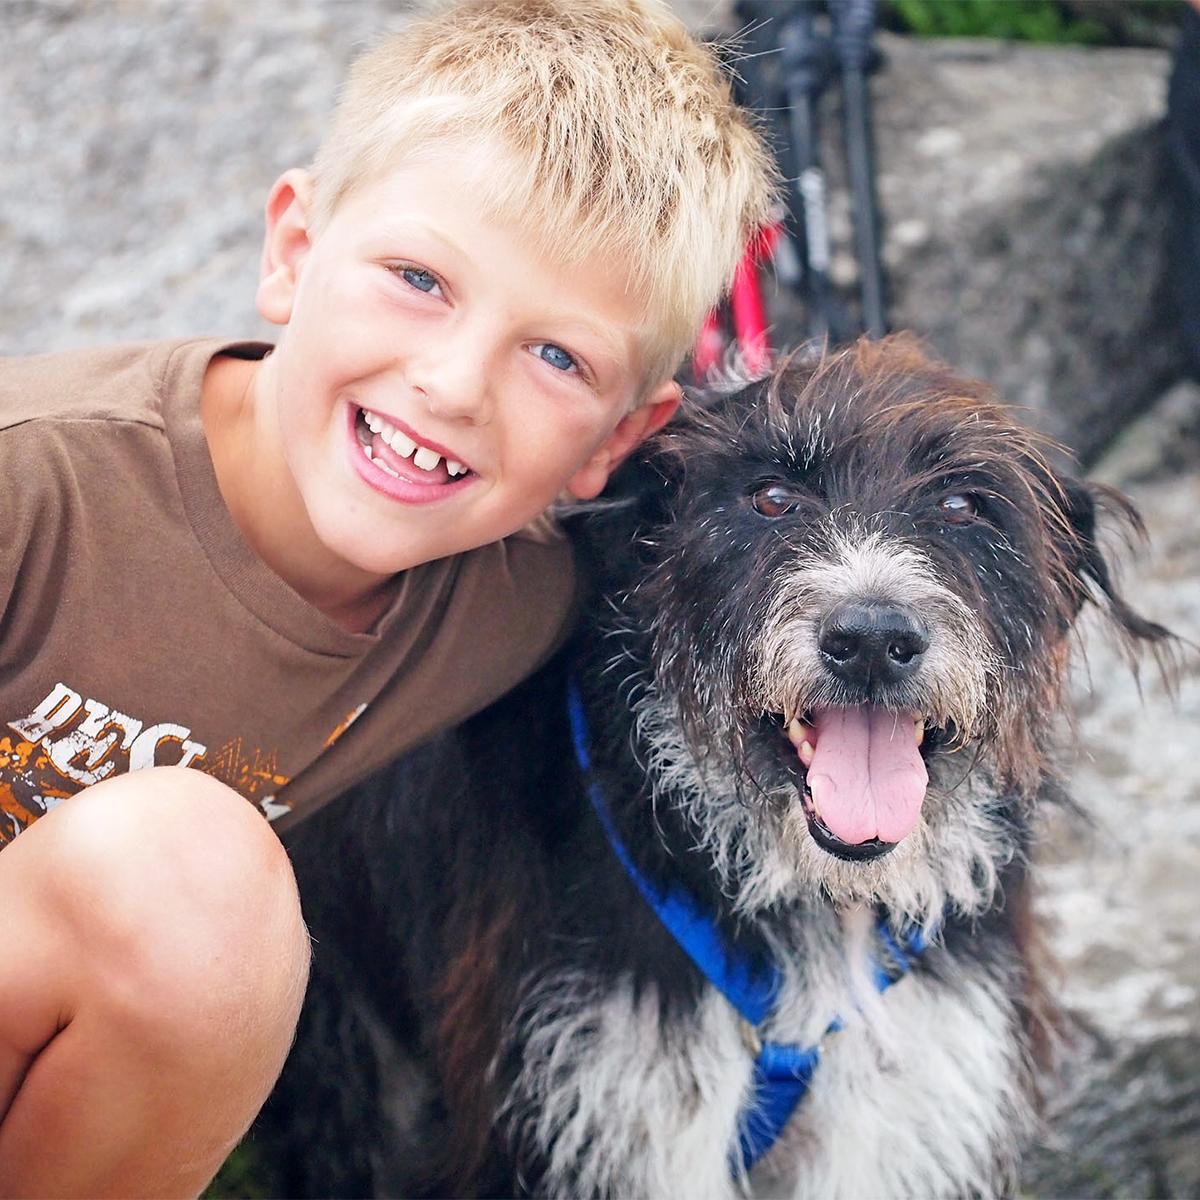 another dog saved macie